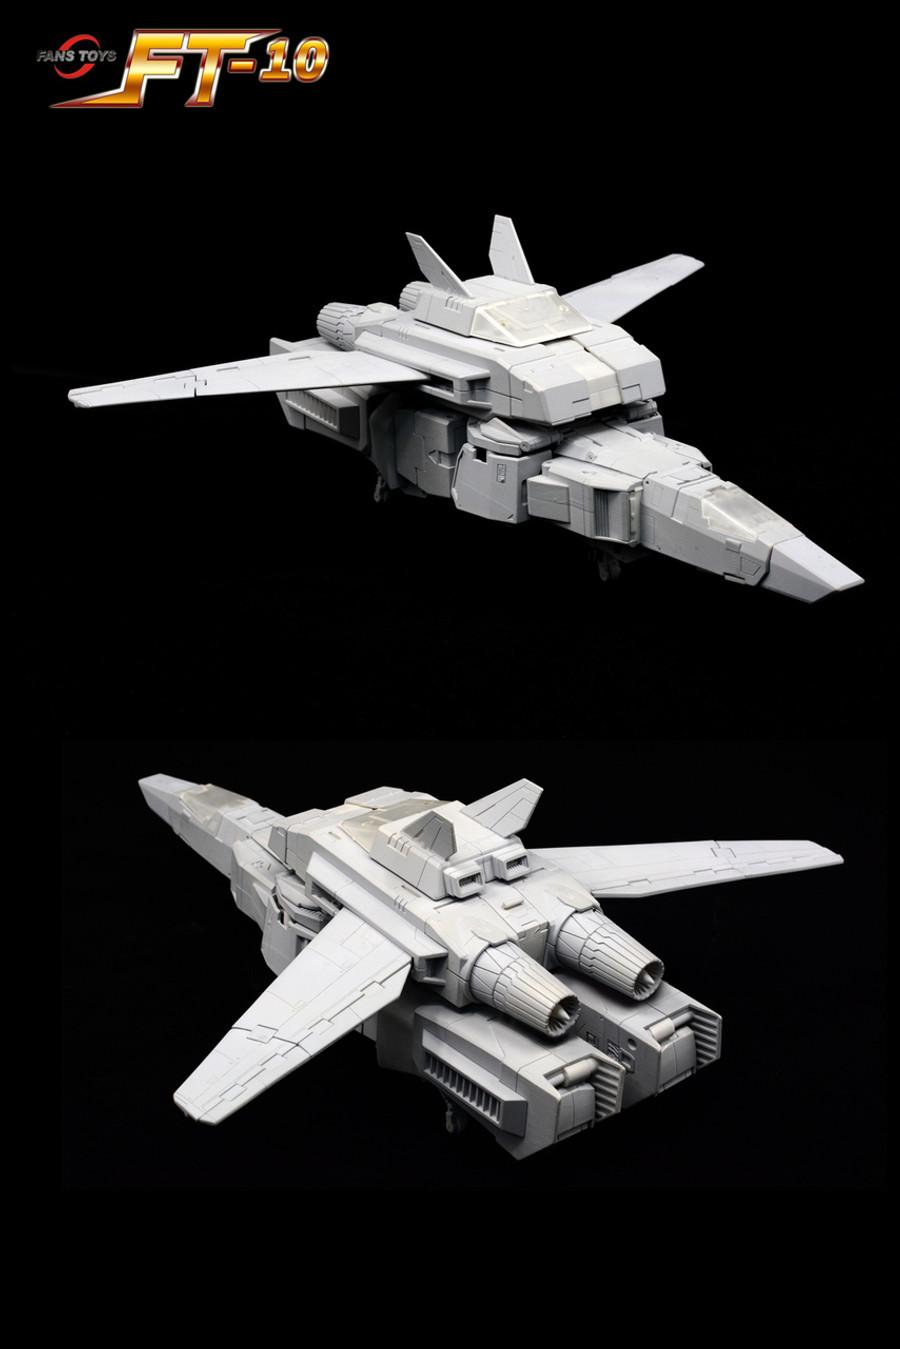 Fans Toys - FT-10 Phoenix - Re-issue